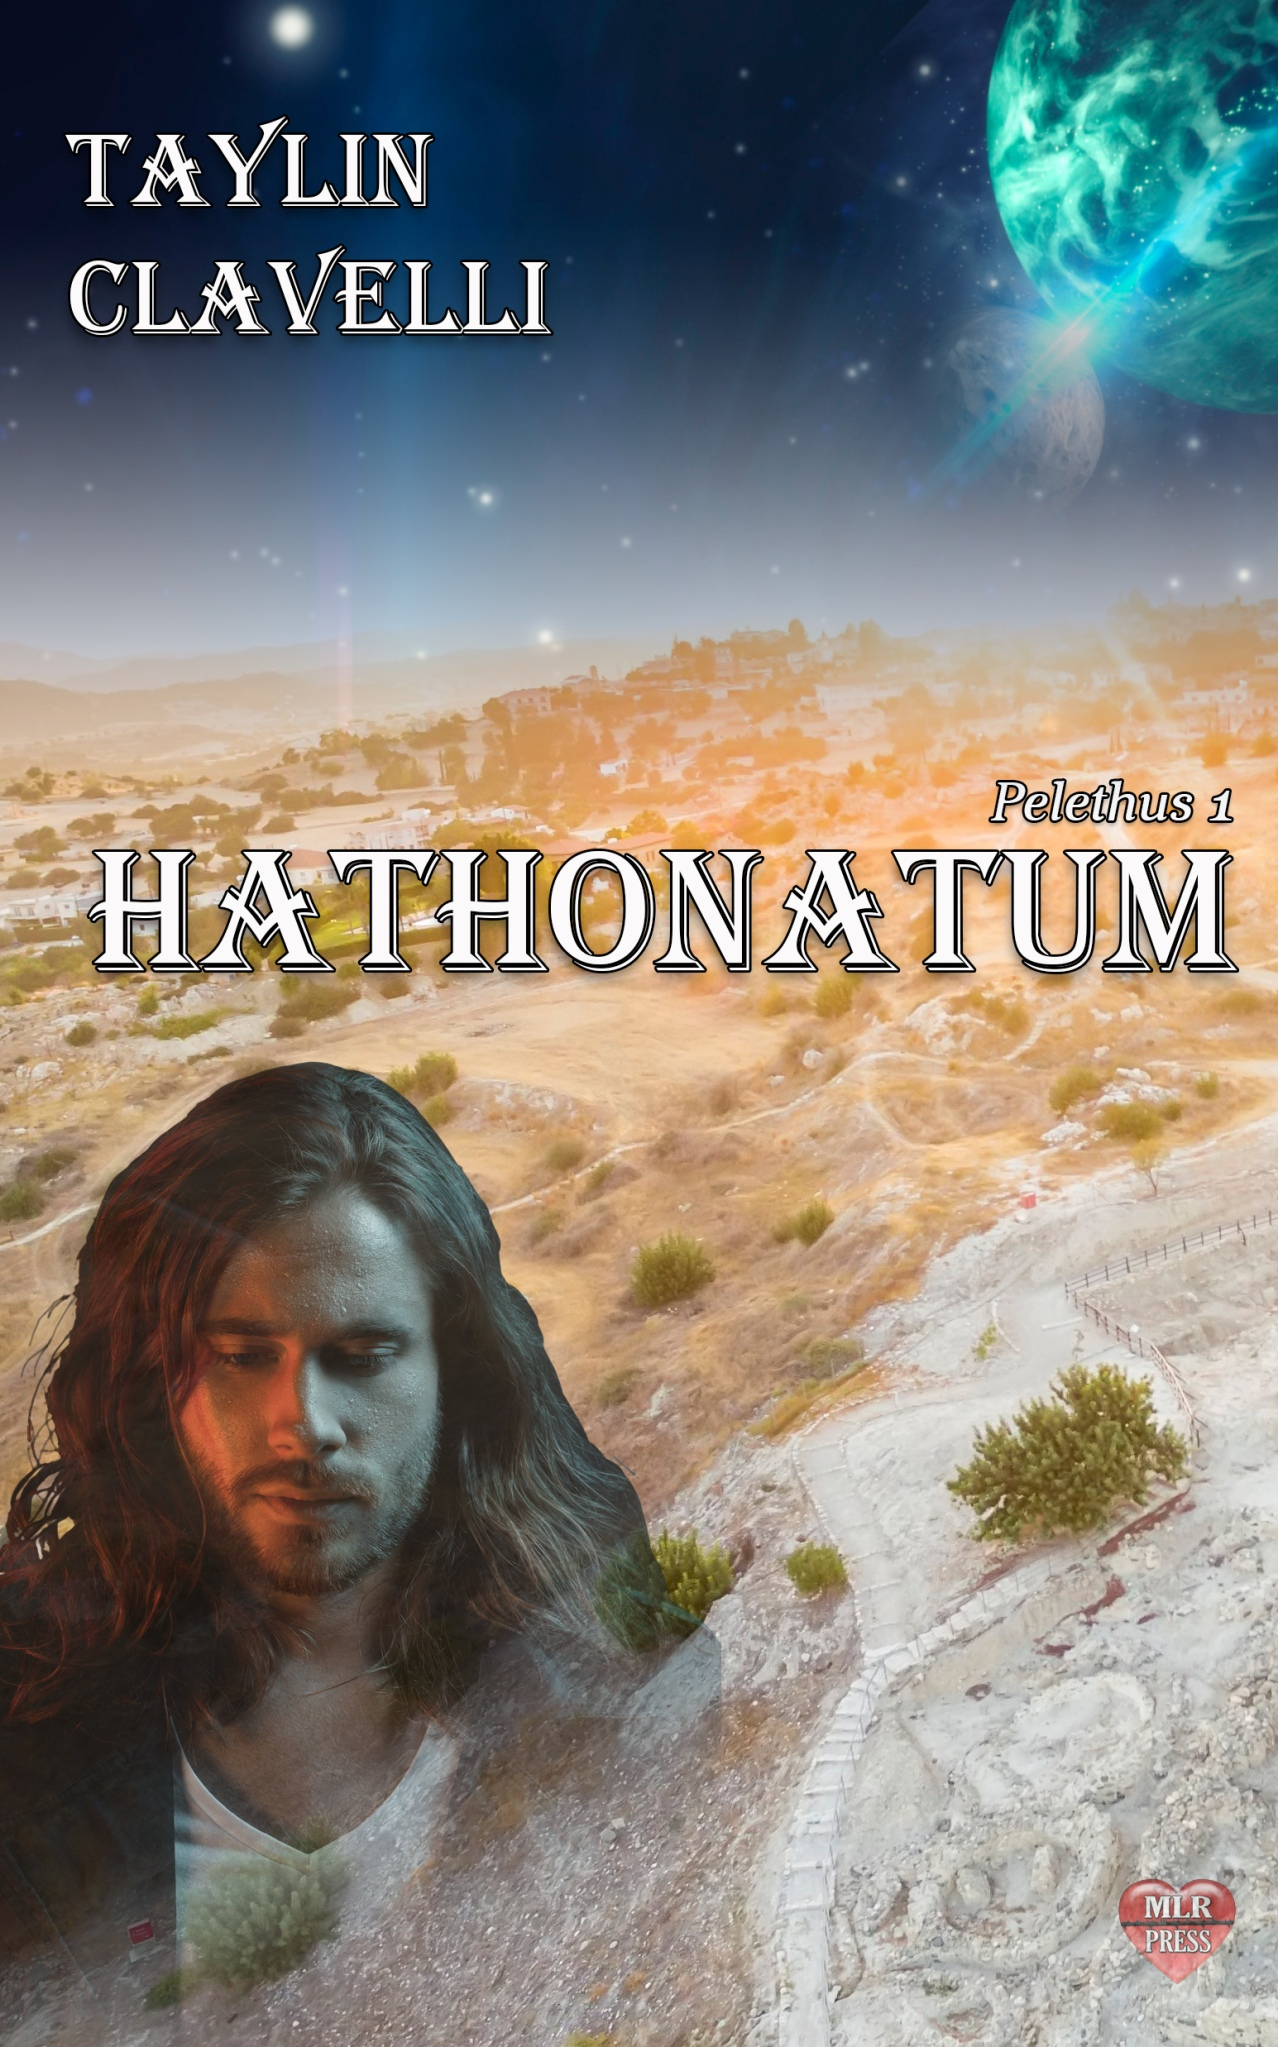 Hathonatum_Clavelli_KJ_final